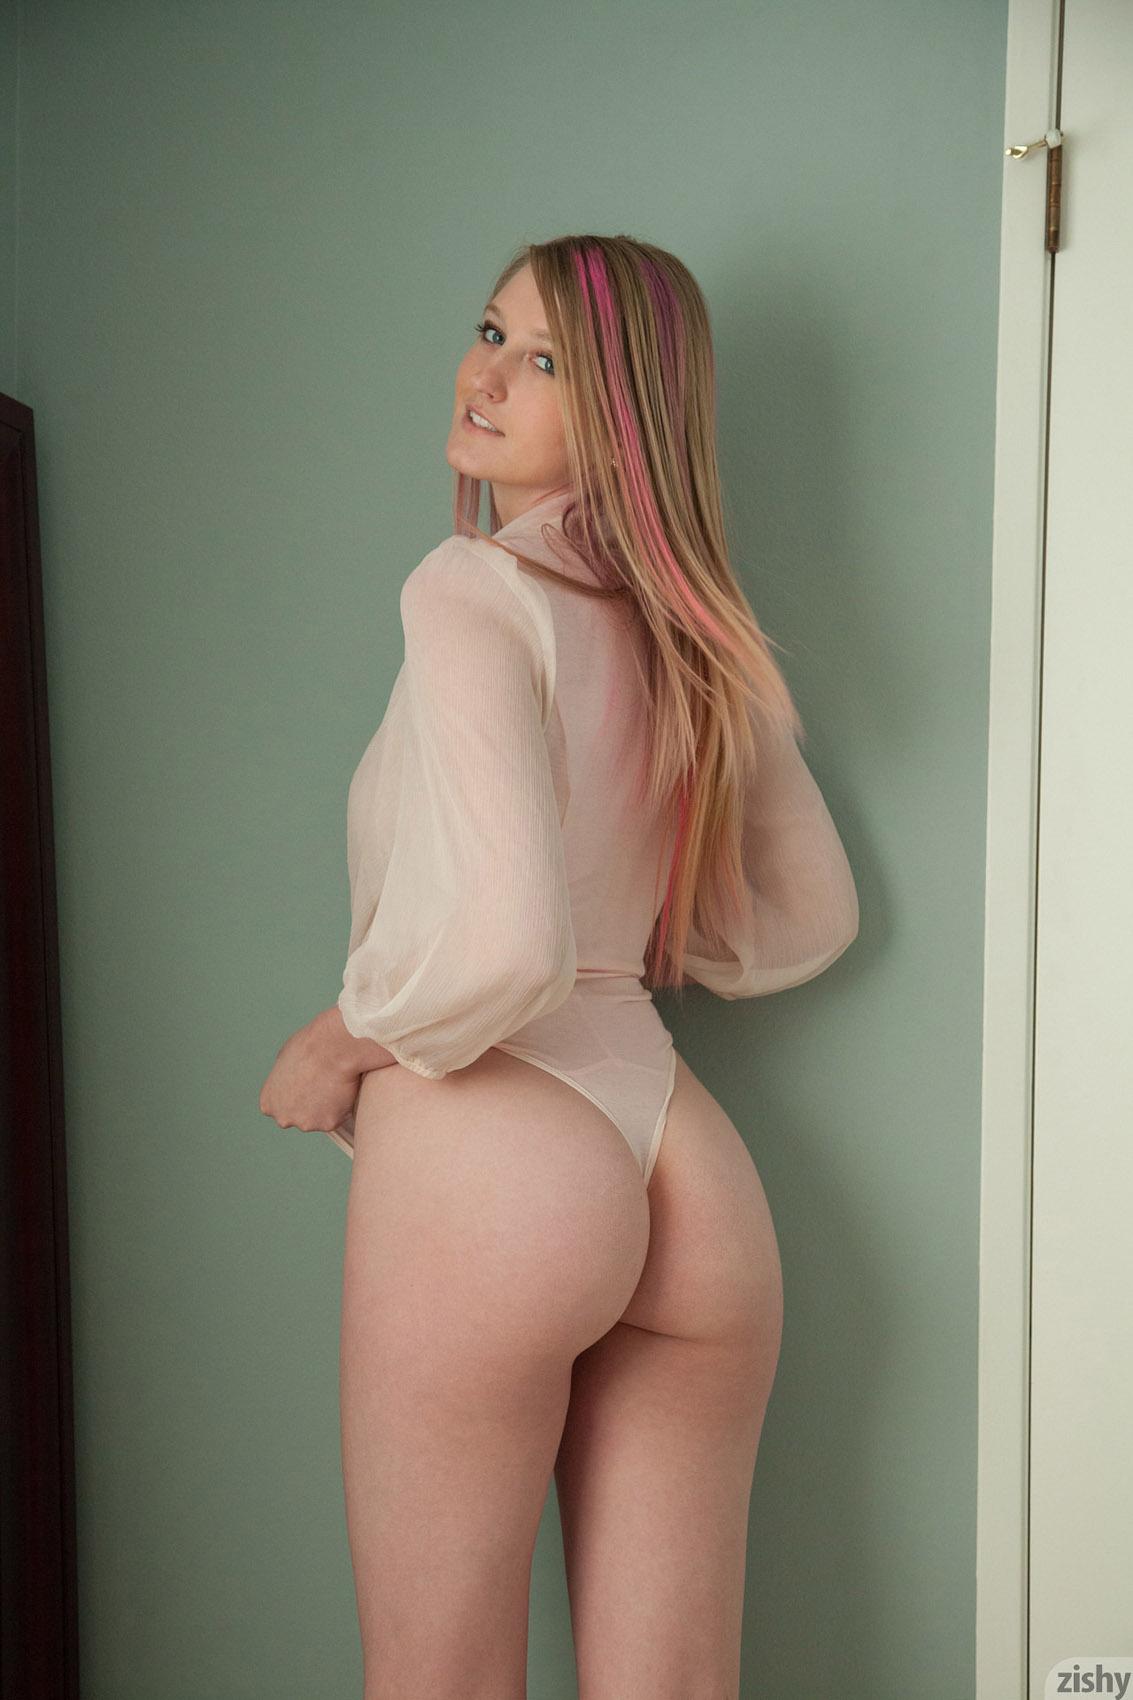 Beautiful webcam girl shows her very nice ass 4